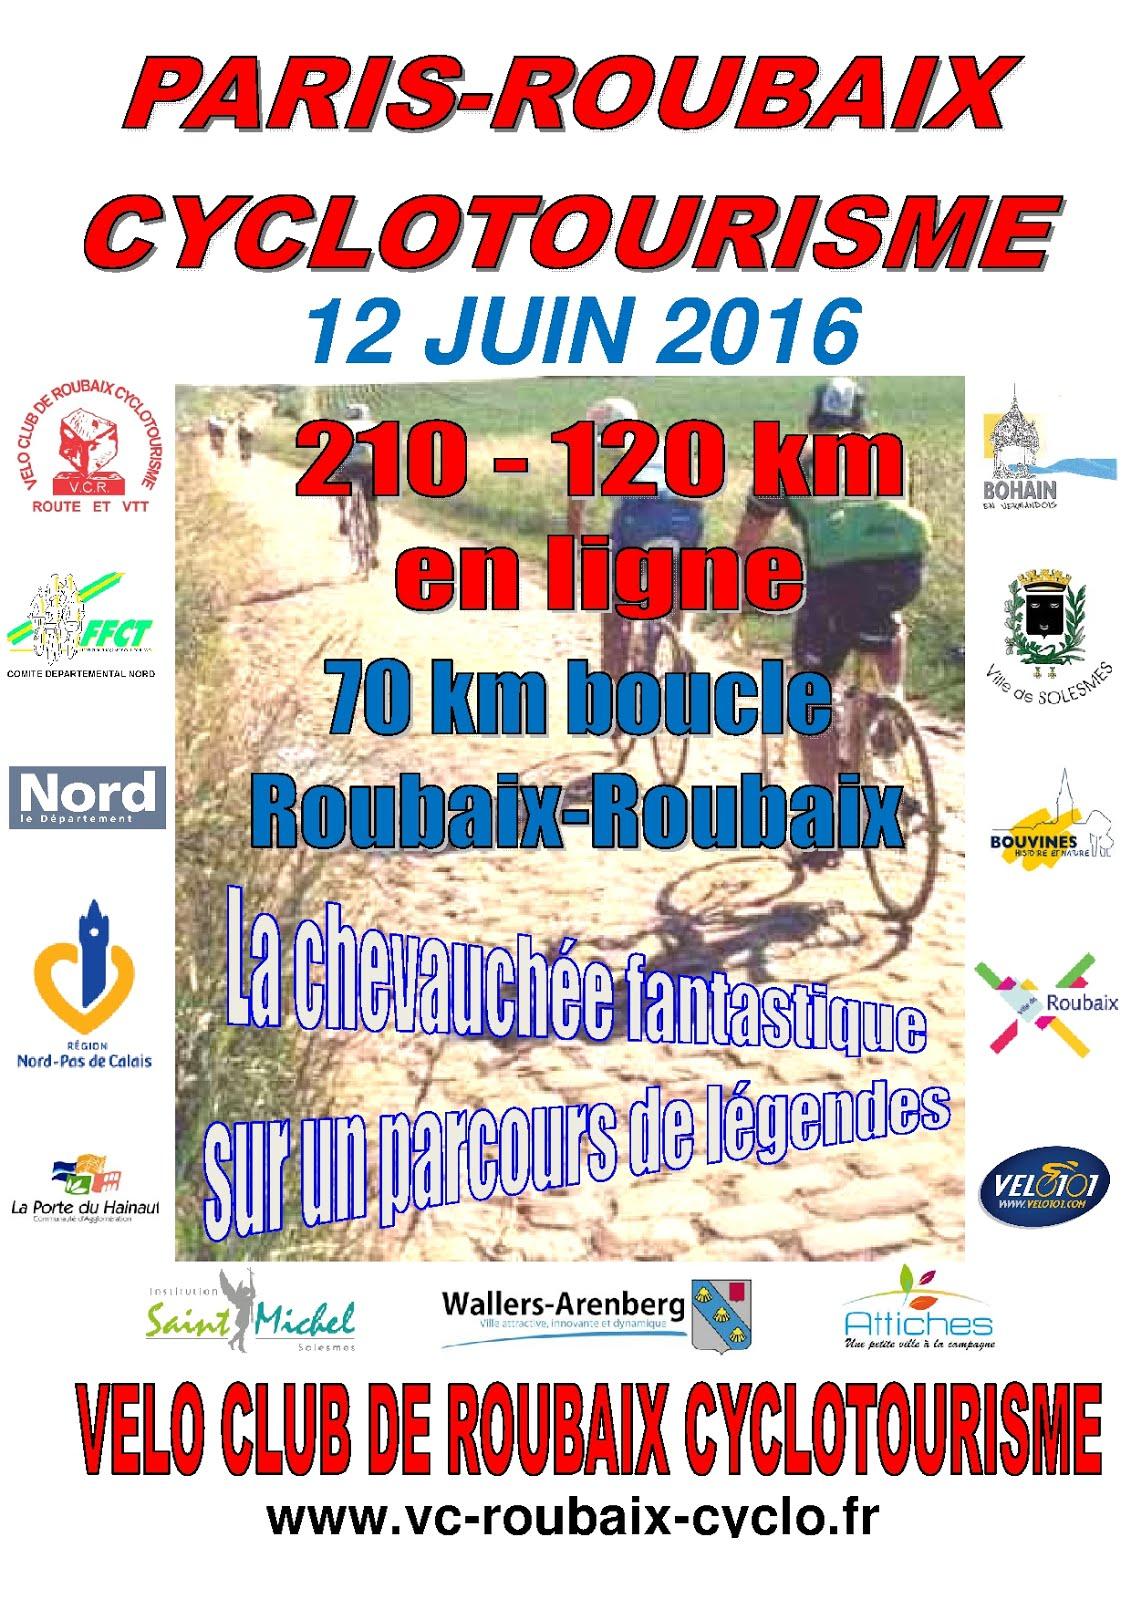 Paris-Roubaix  Cyclotourisme